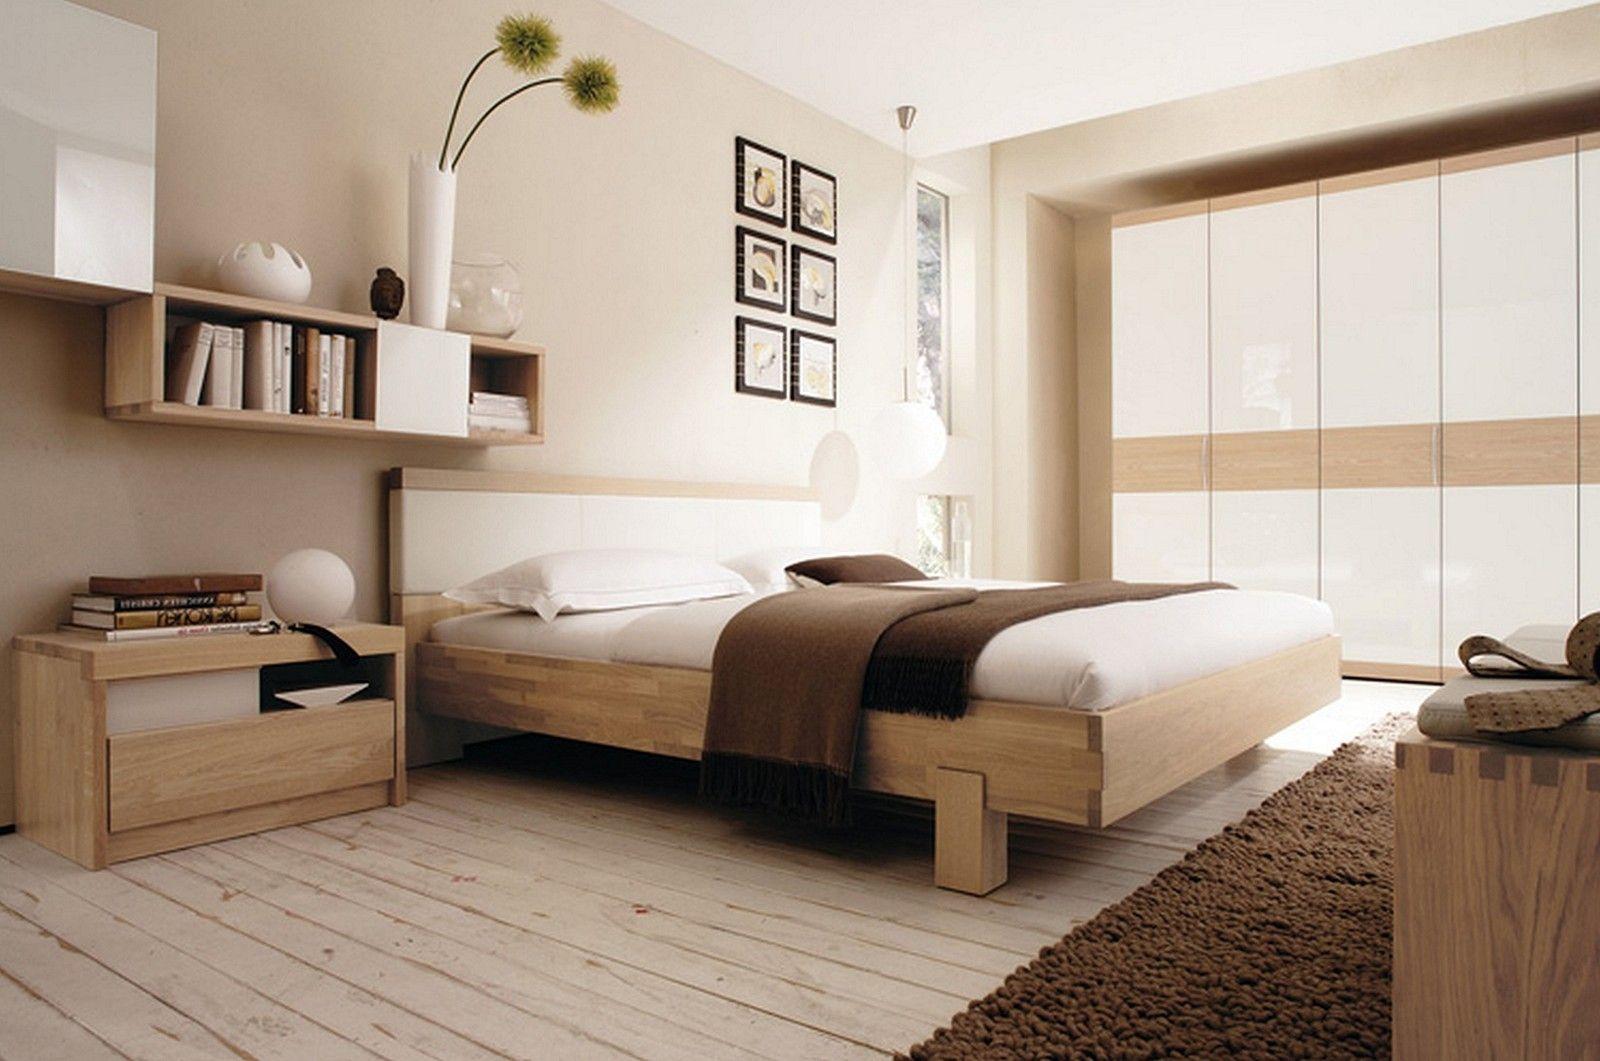 japanese style bedroom design | home sweet home | pinterest